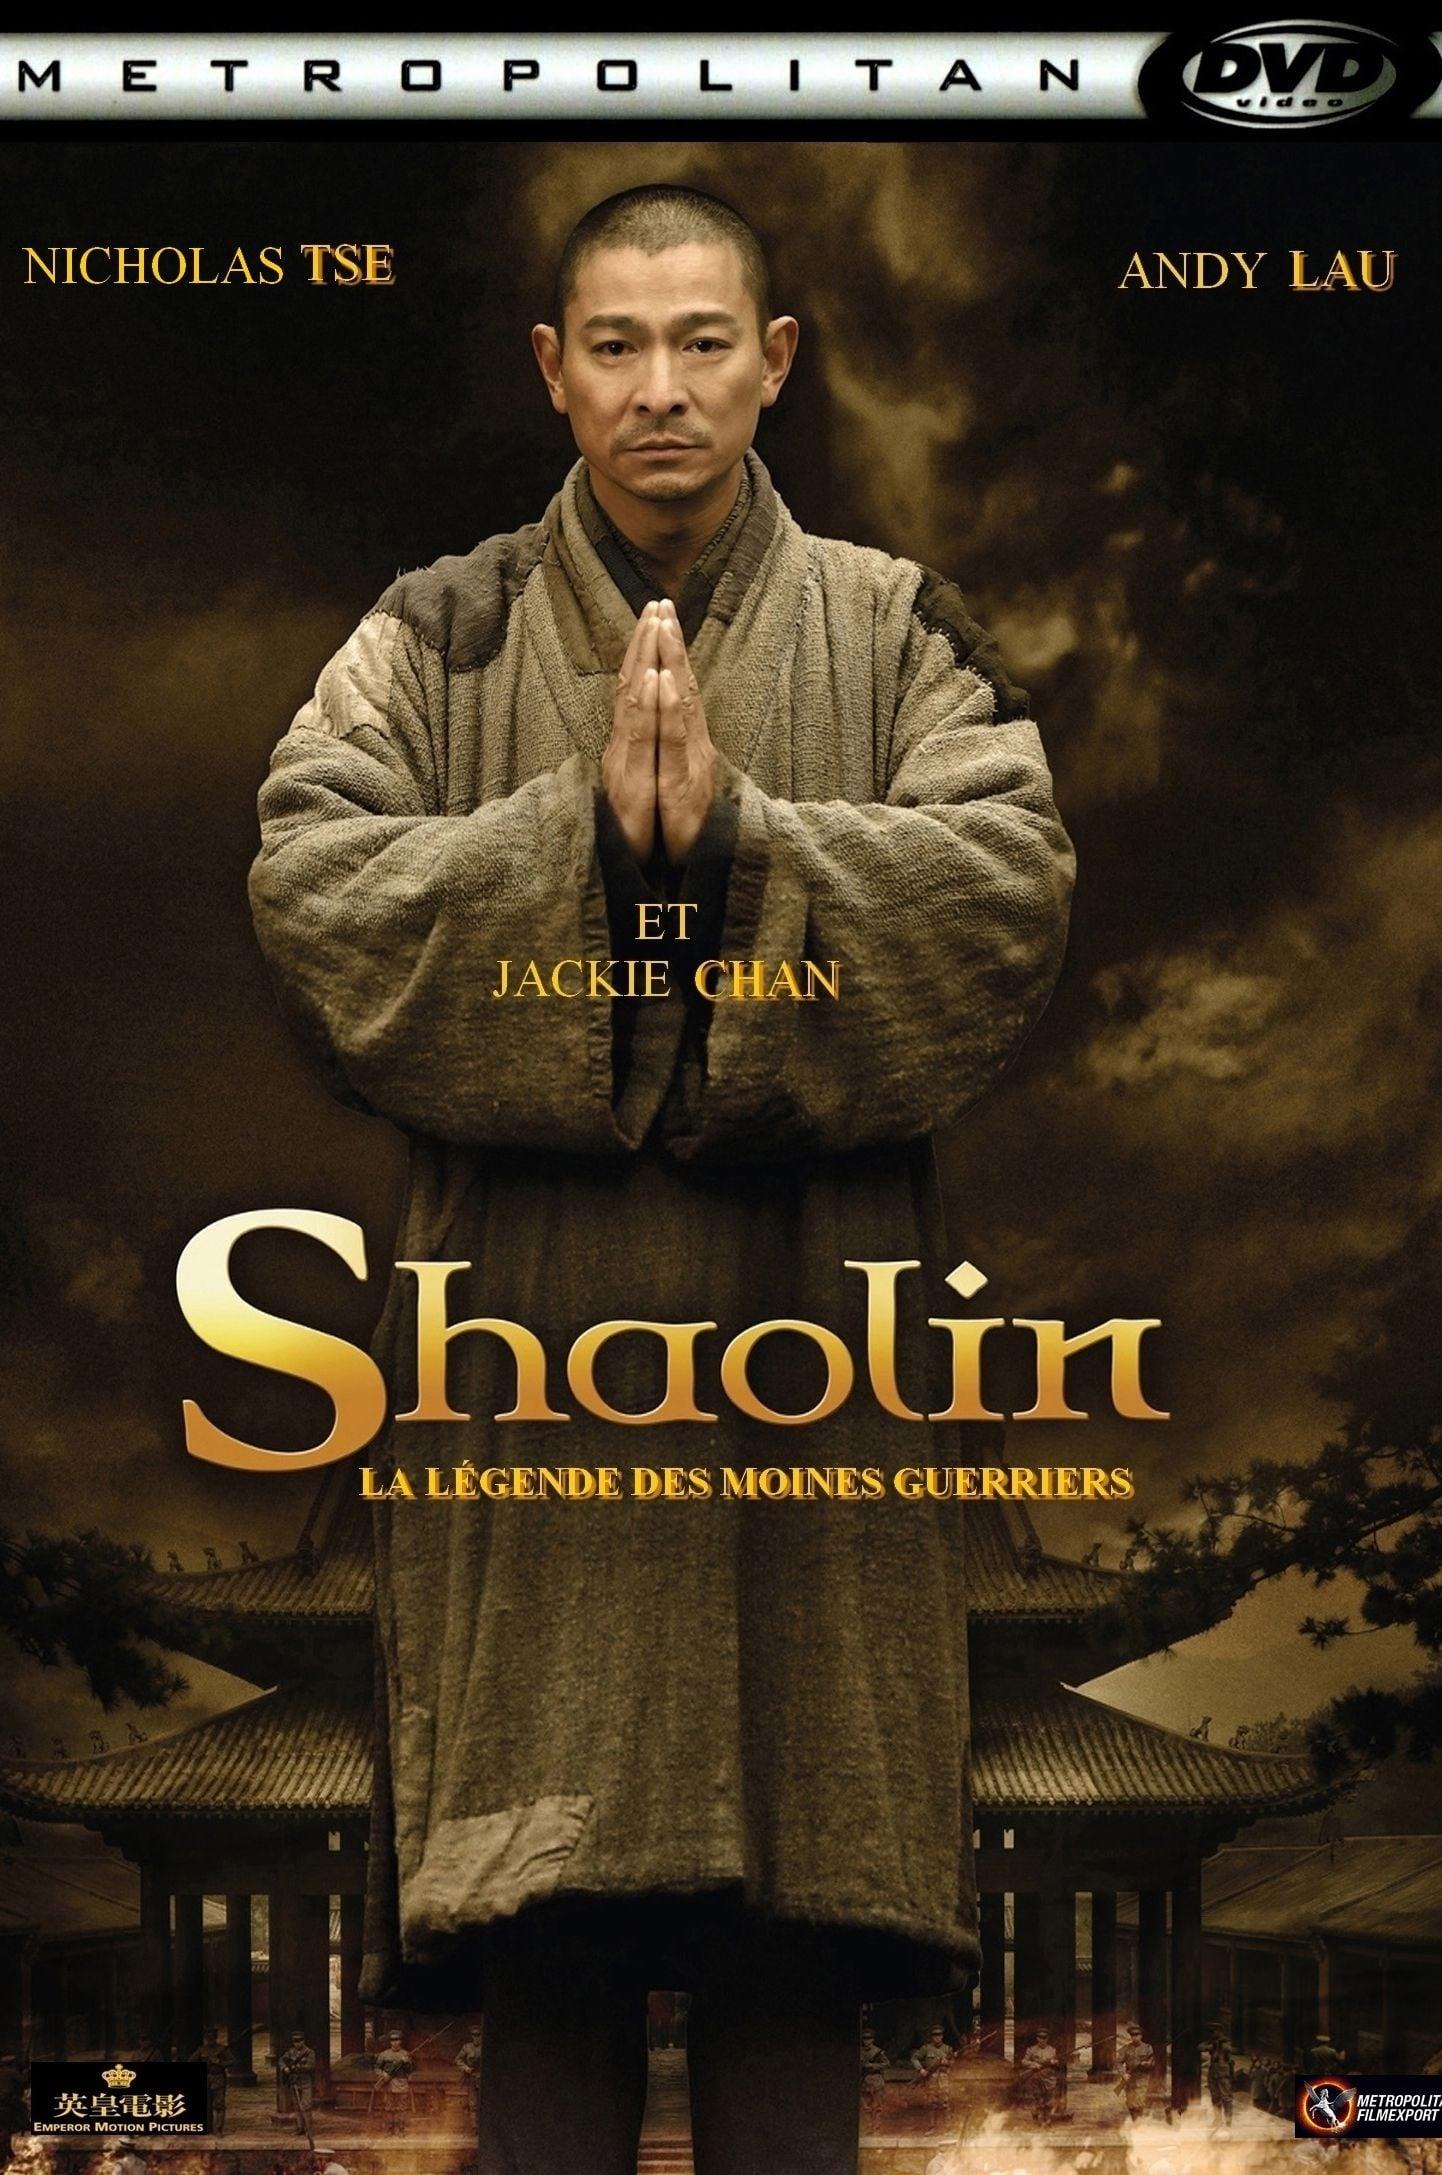 Shaolin La Legende Des Moines Guerriers 2011 Streaming Complet Vf